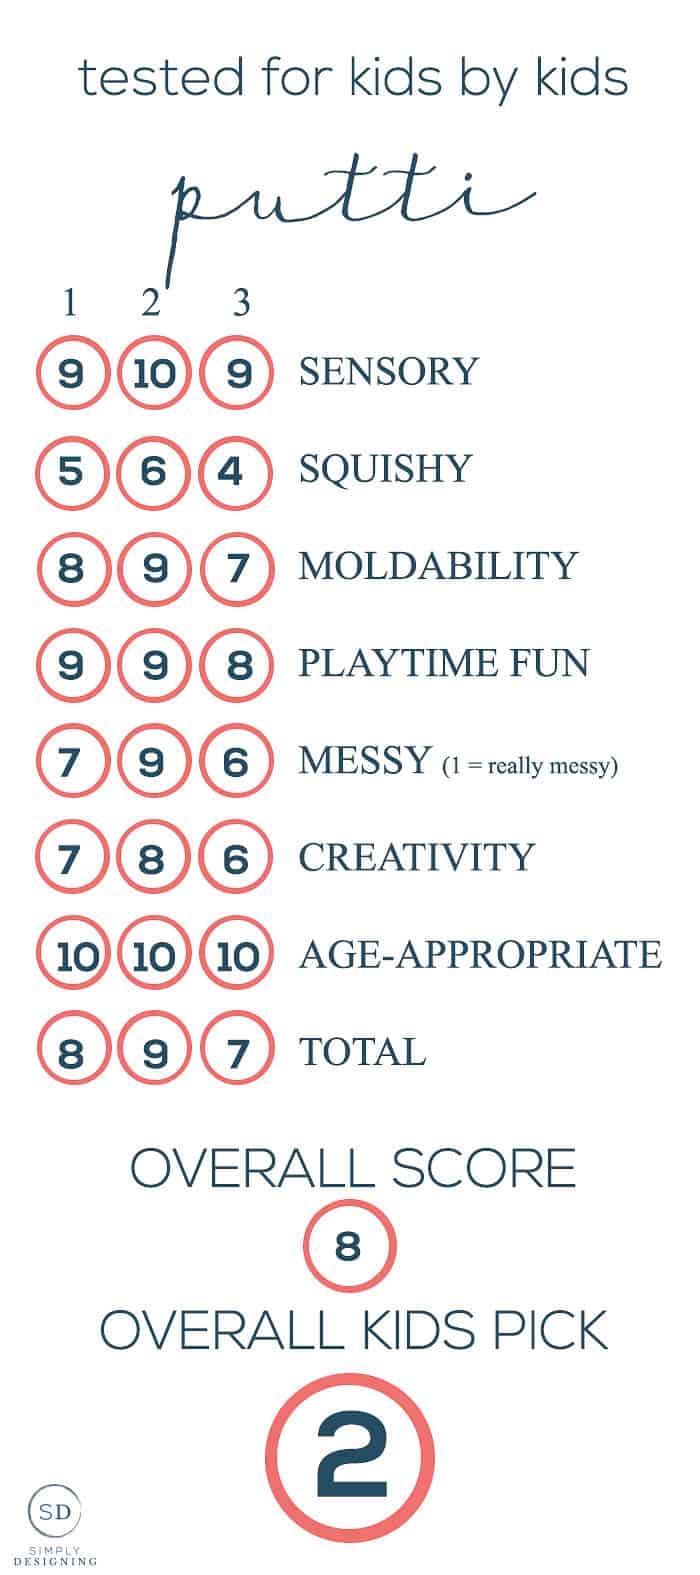 tested by kids for kids - sensory sand throwdown - putti-